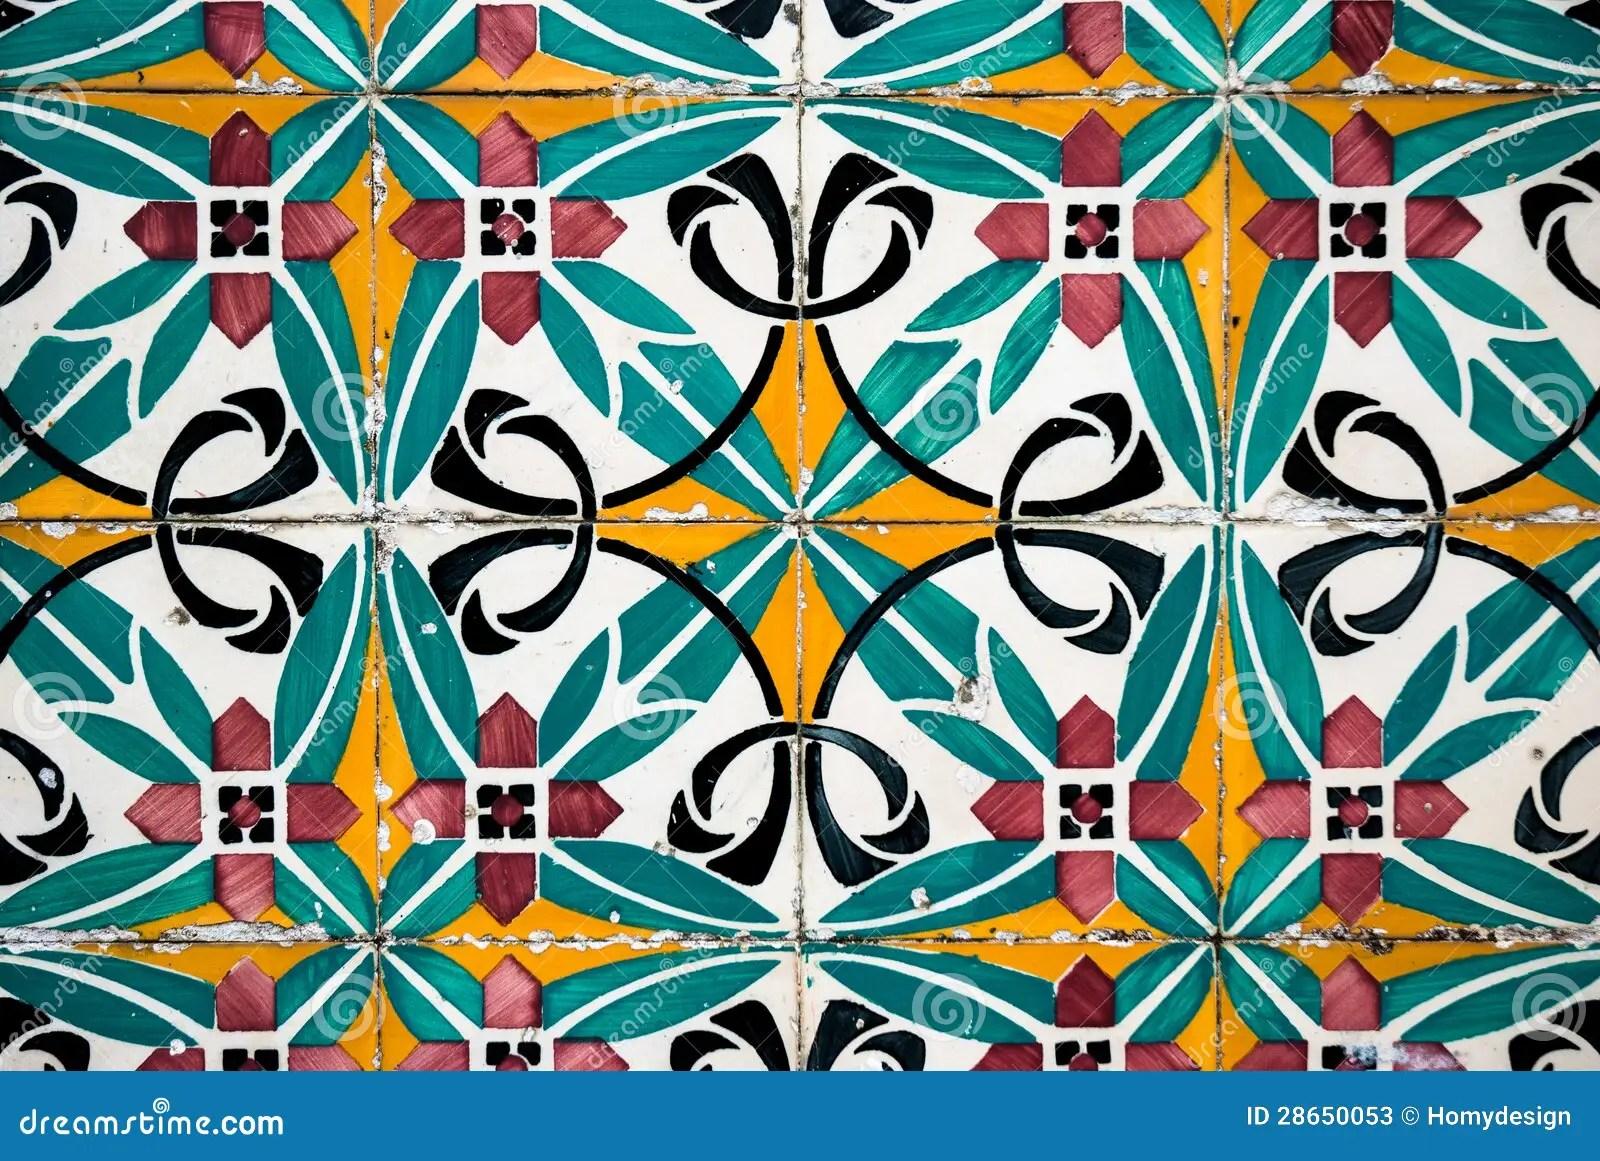 Vintage Spanish Tiles Stock Image Image Of Background